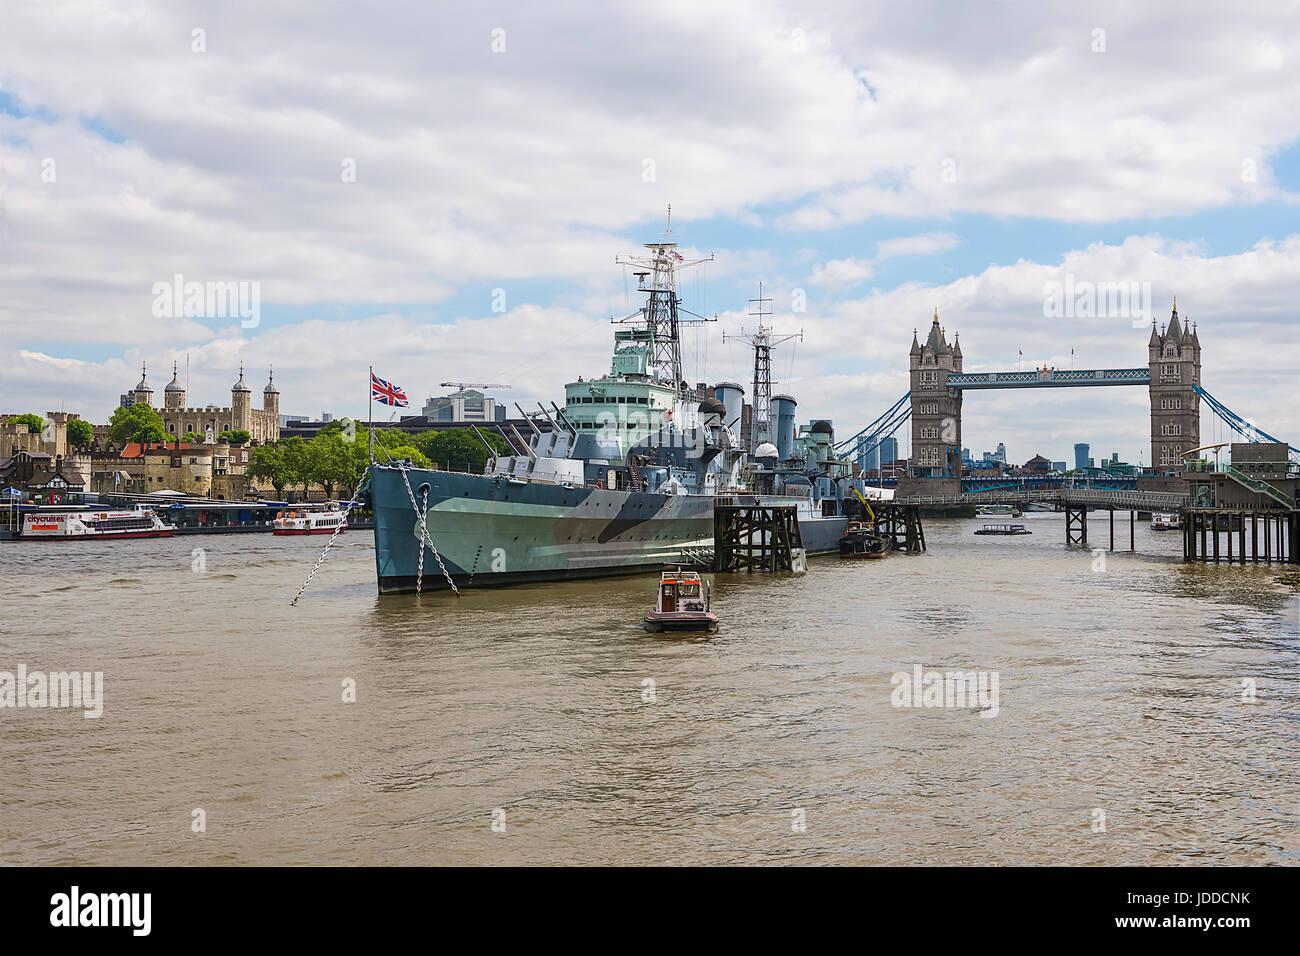 HMS Belfast - Stock Image